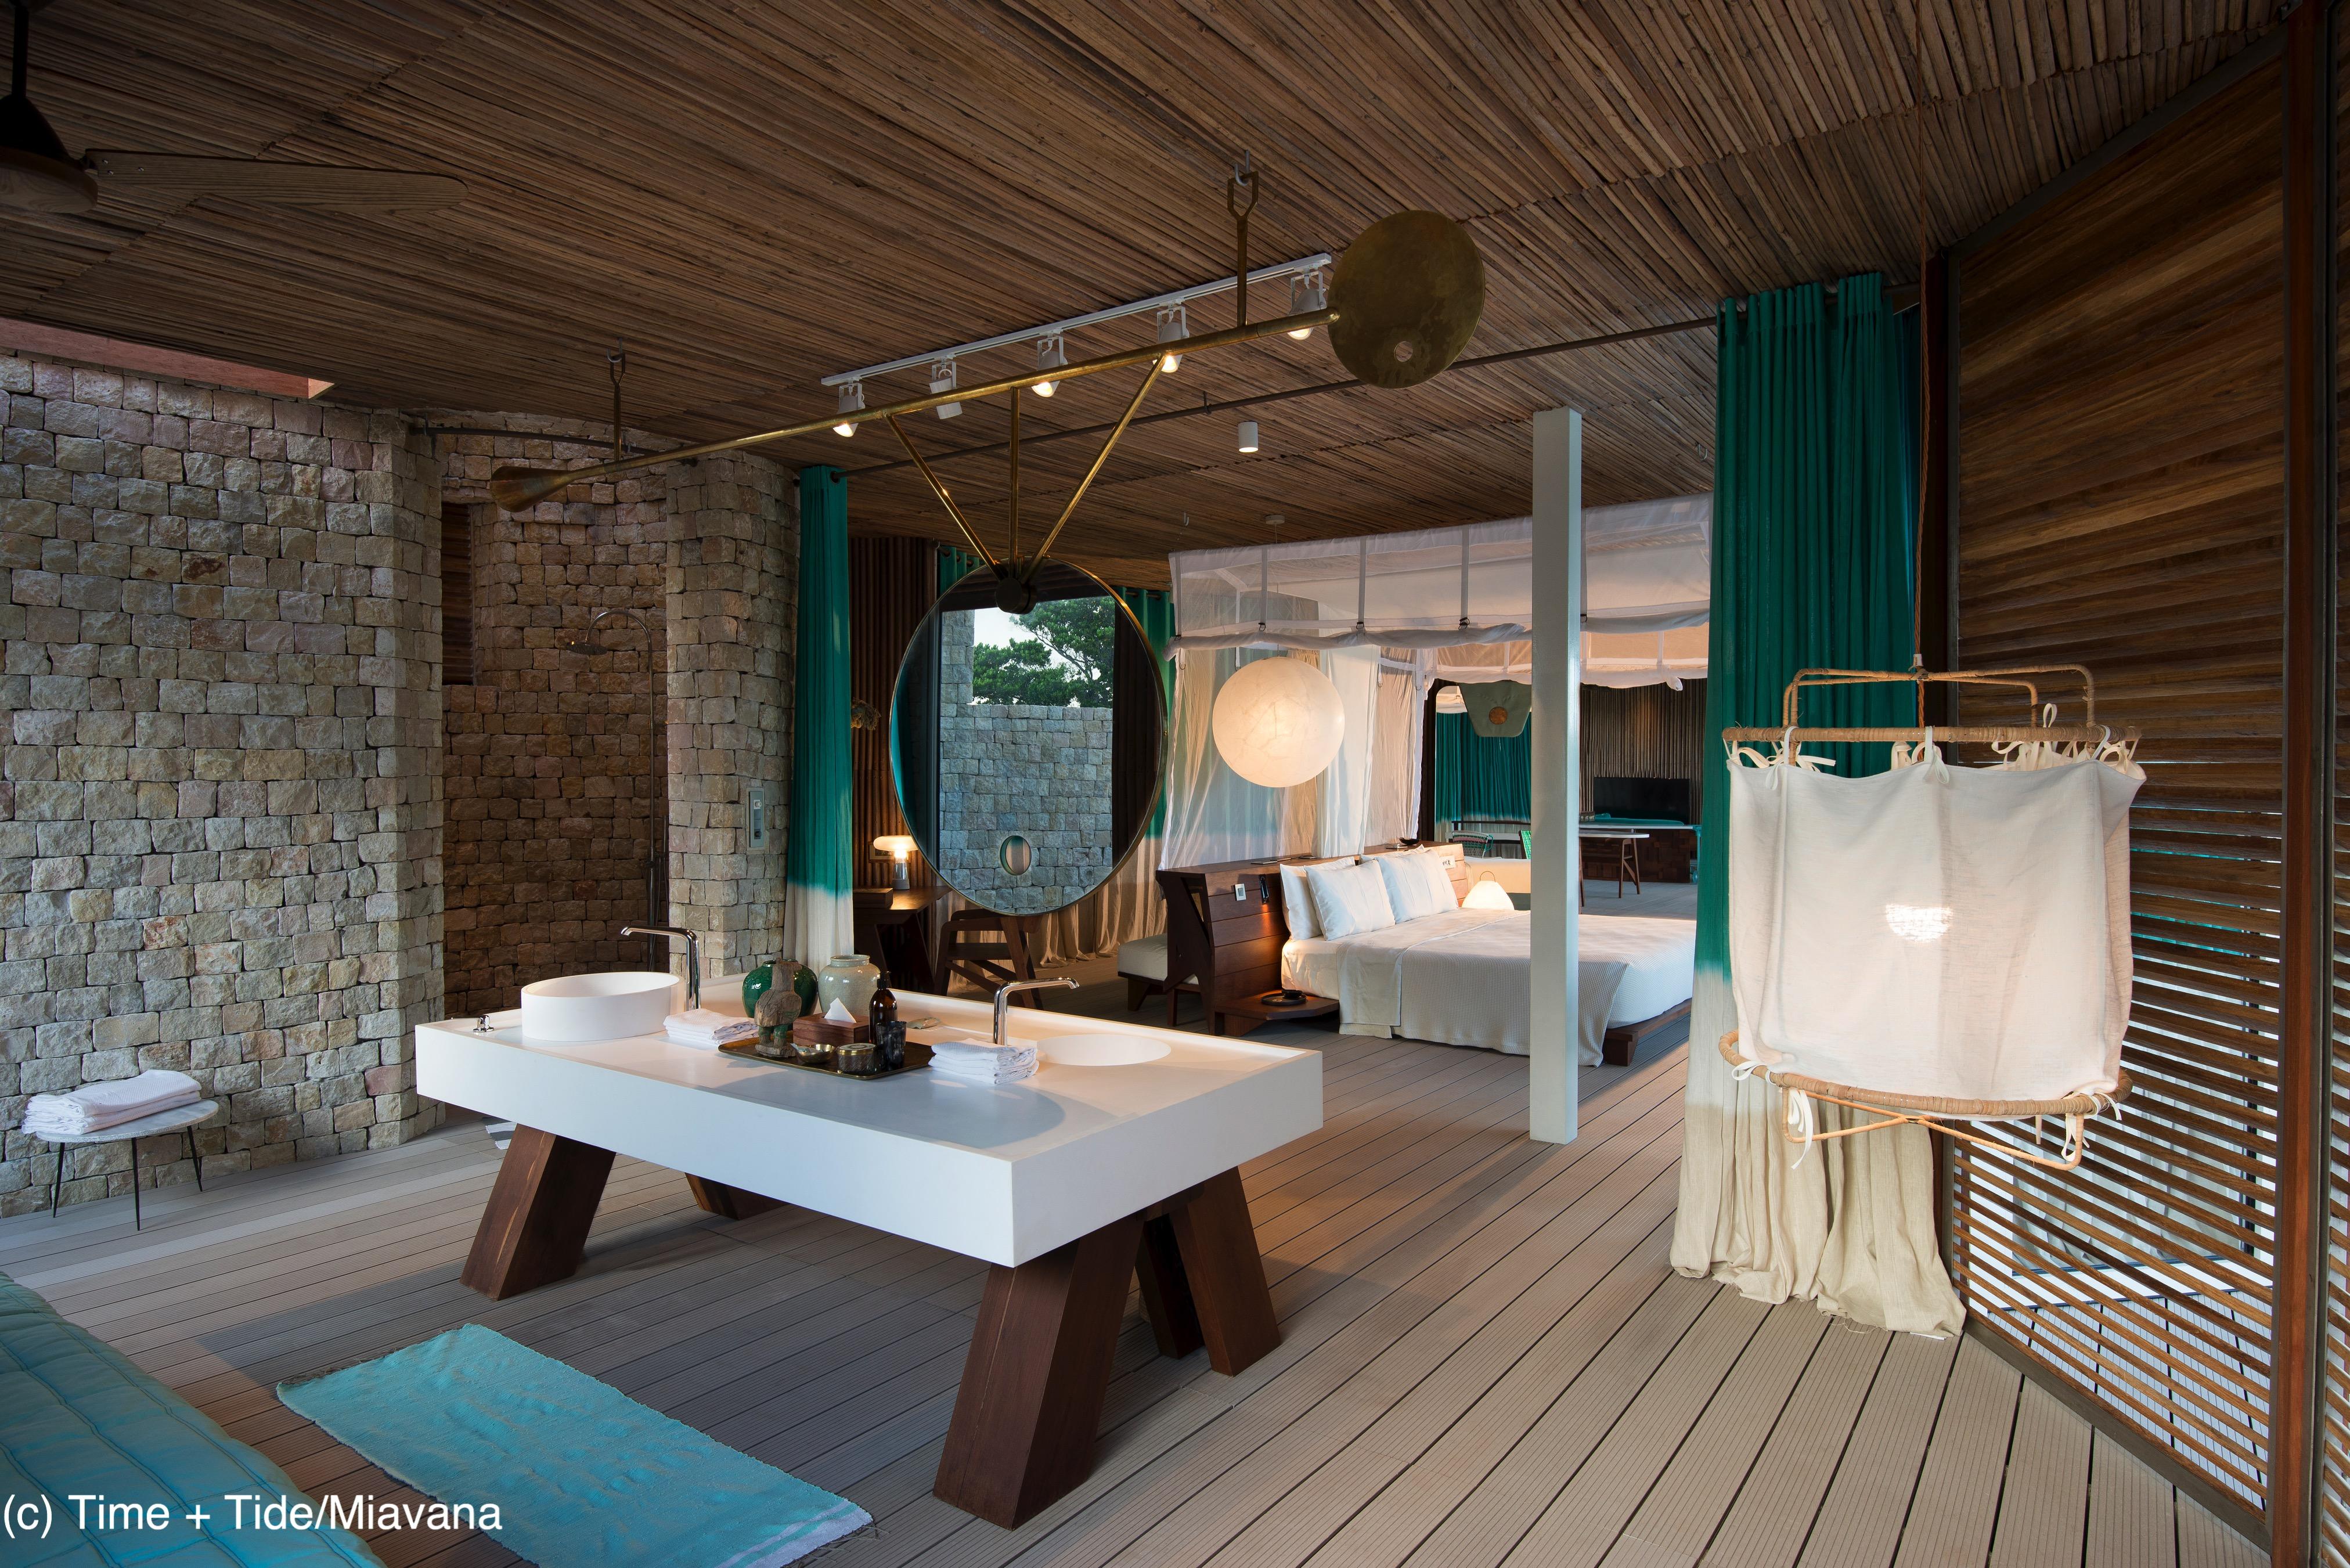 miavana-luxury-eco-lodge-nosy-ankao